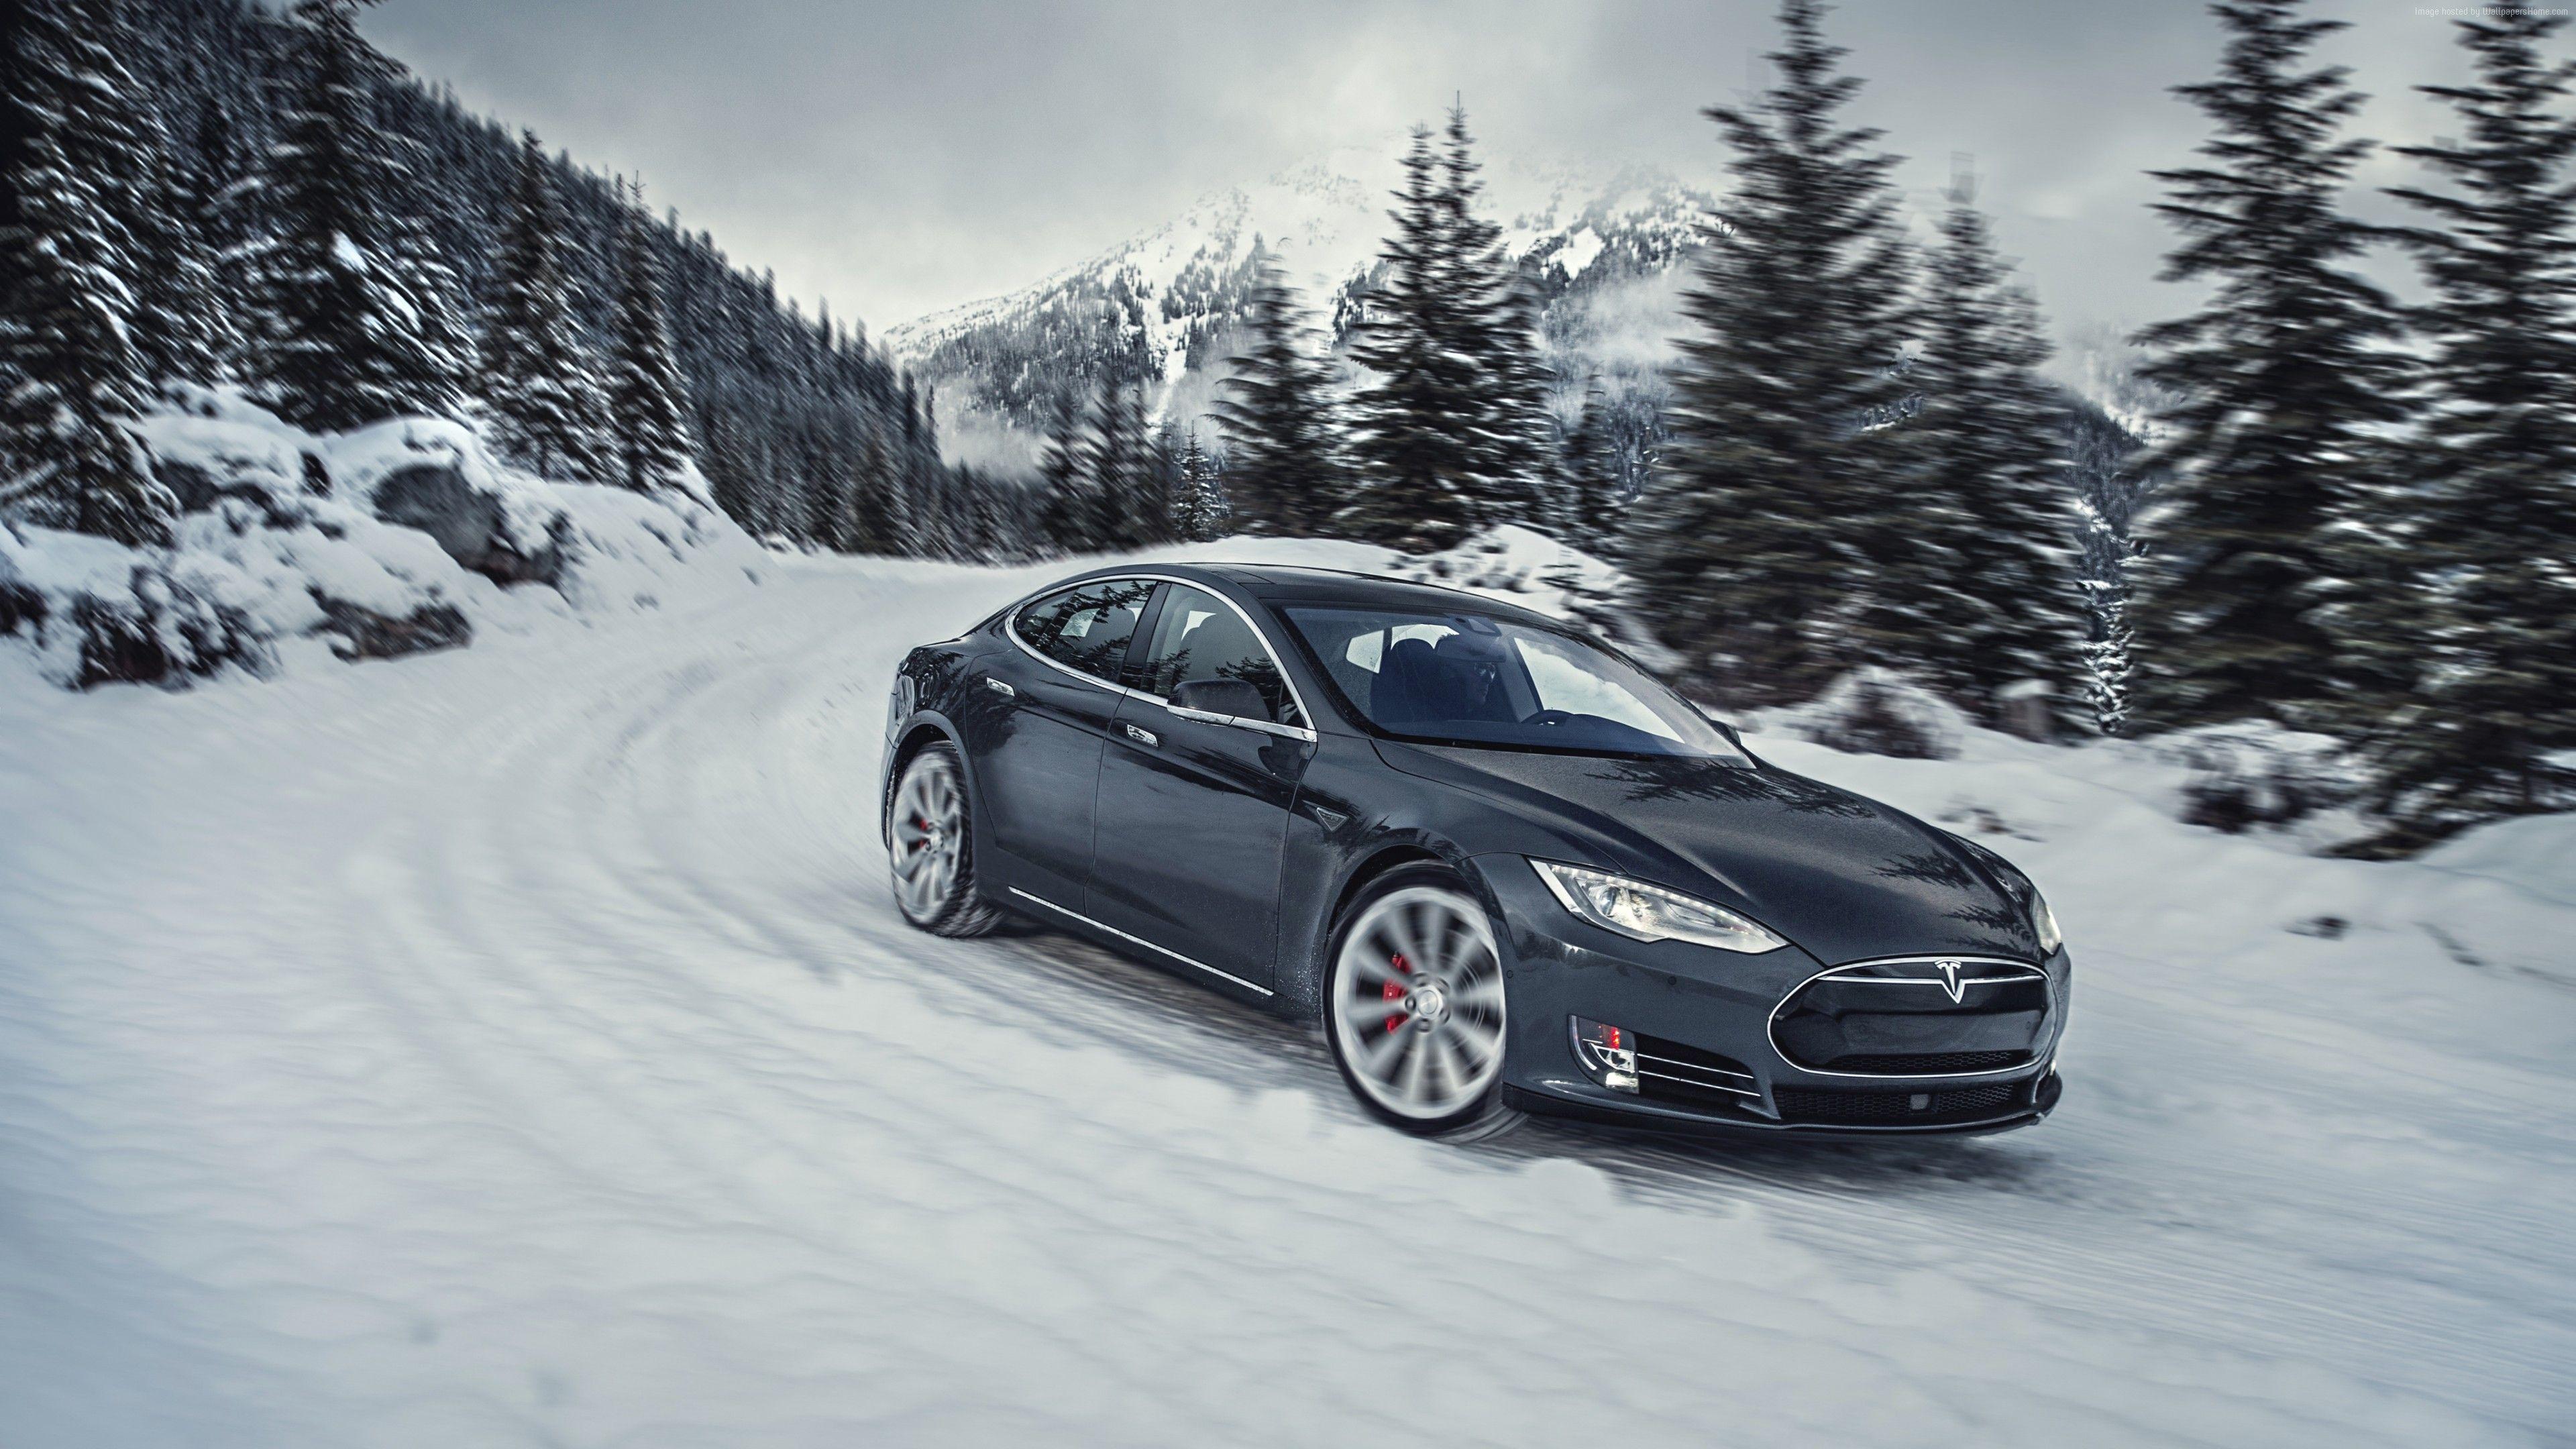 Tesla Model S Black Wallpaper For Iphone